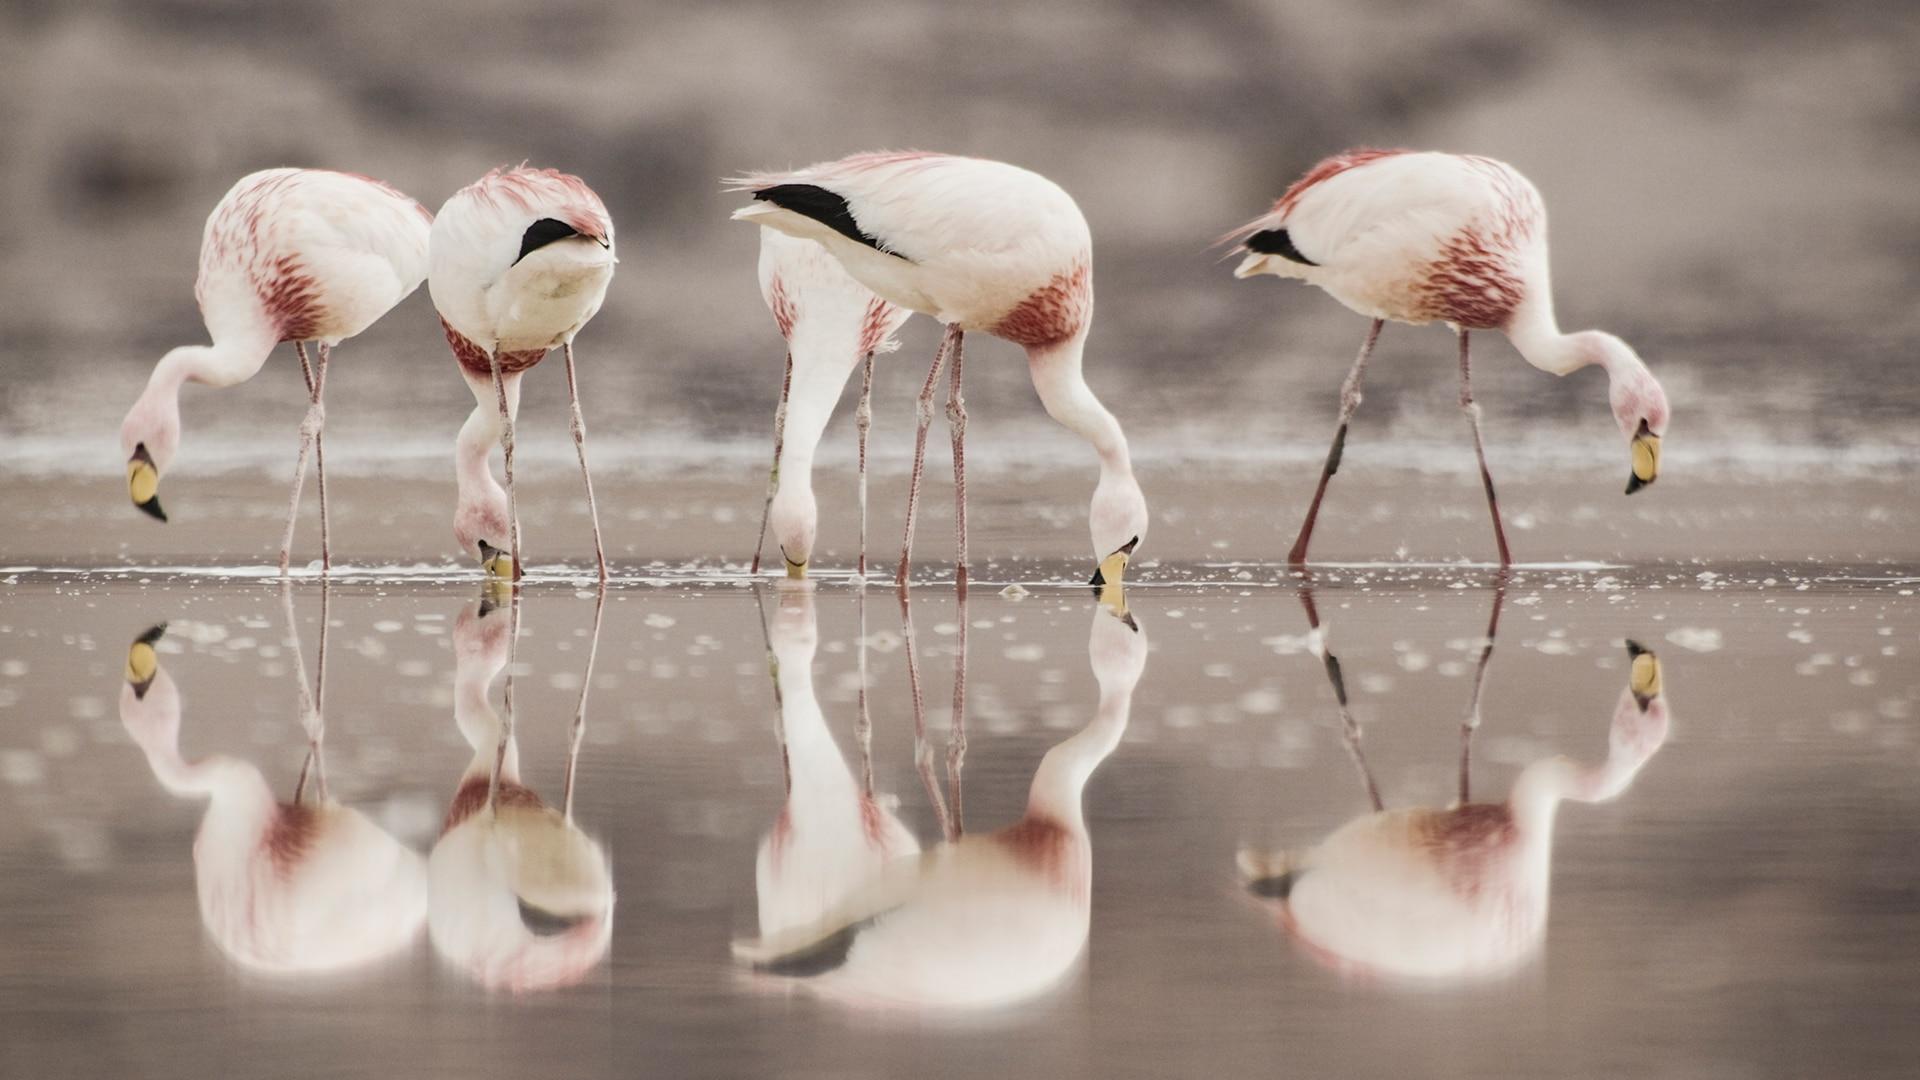 Flamingos feed on brine shrimp in high altitude lagoons